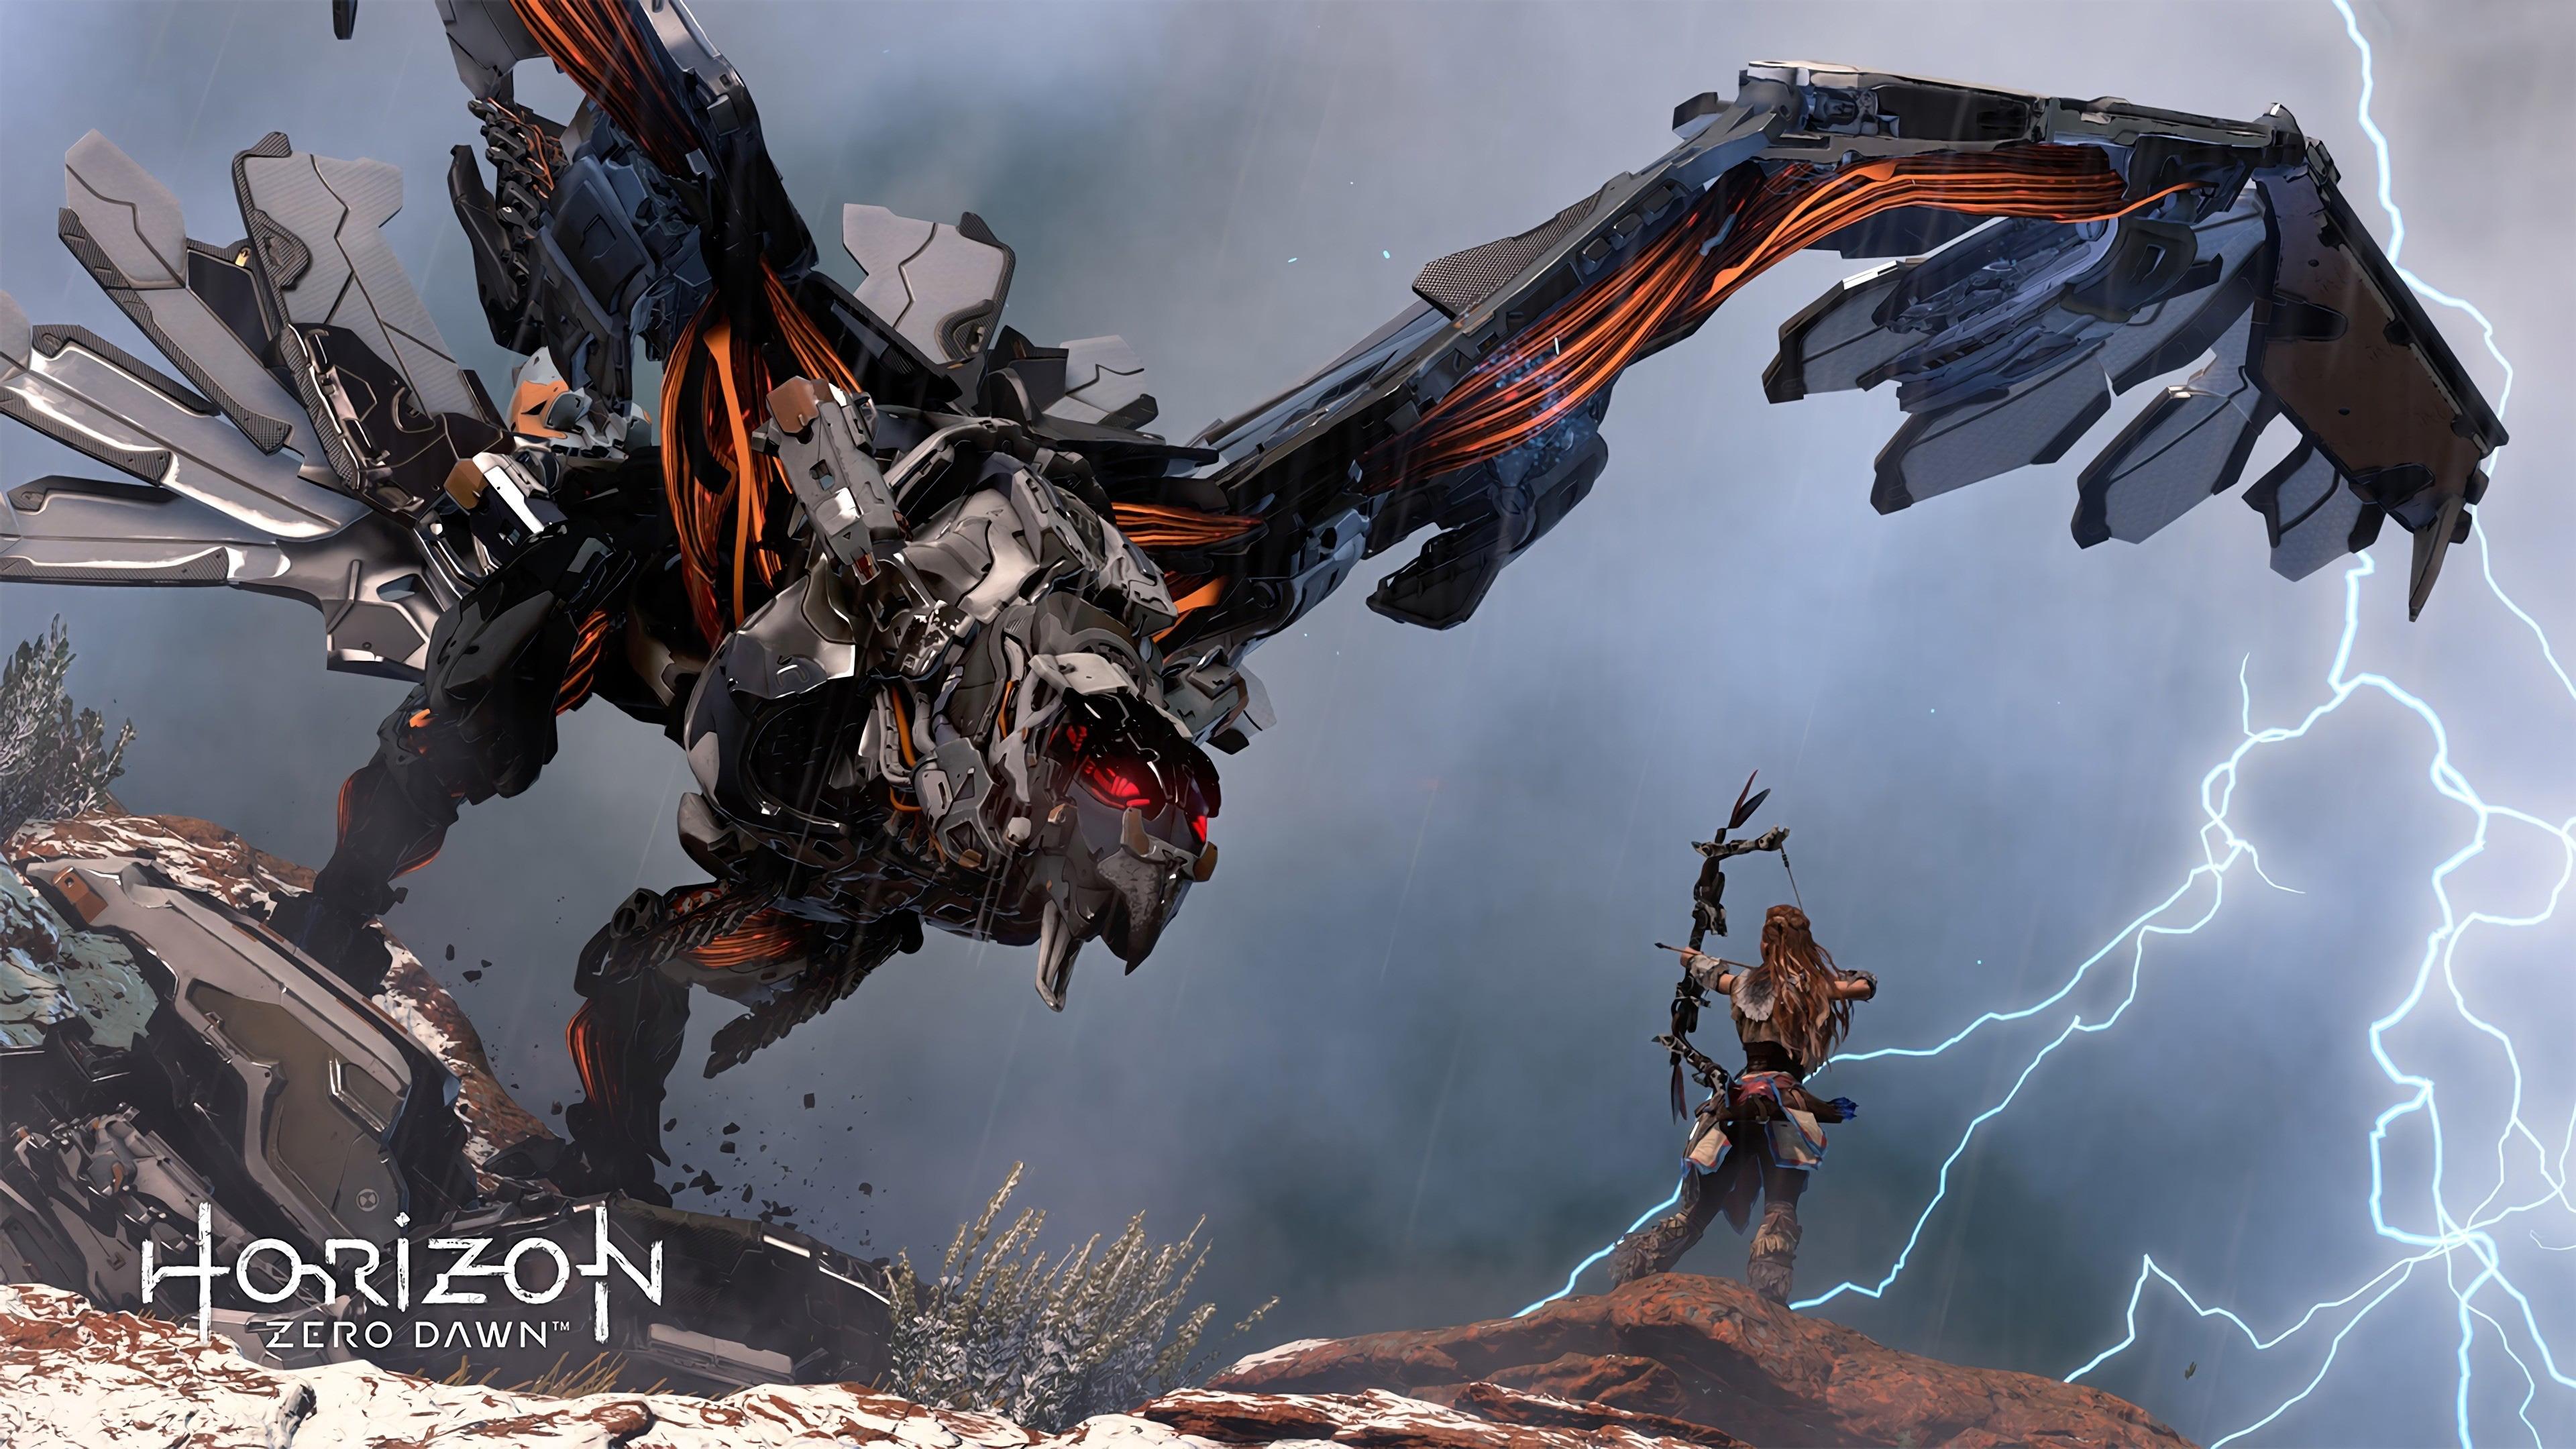 Horizon Zero Dawn 4k - Video Game Wallpaper 4k , HD Wallpaper & Backgrounds